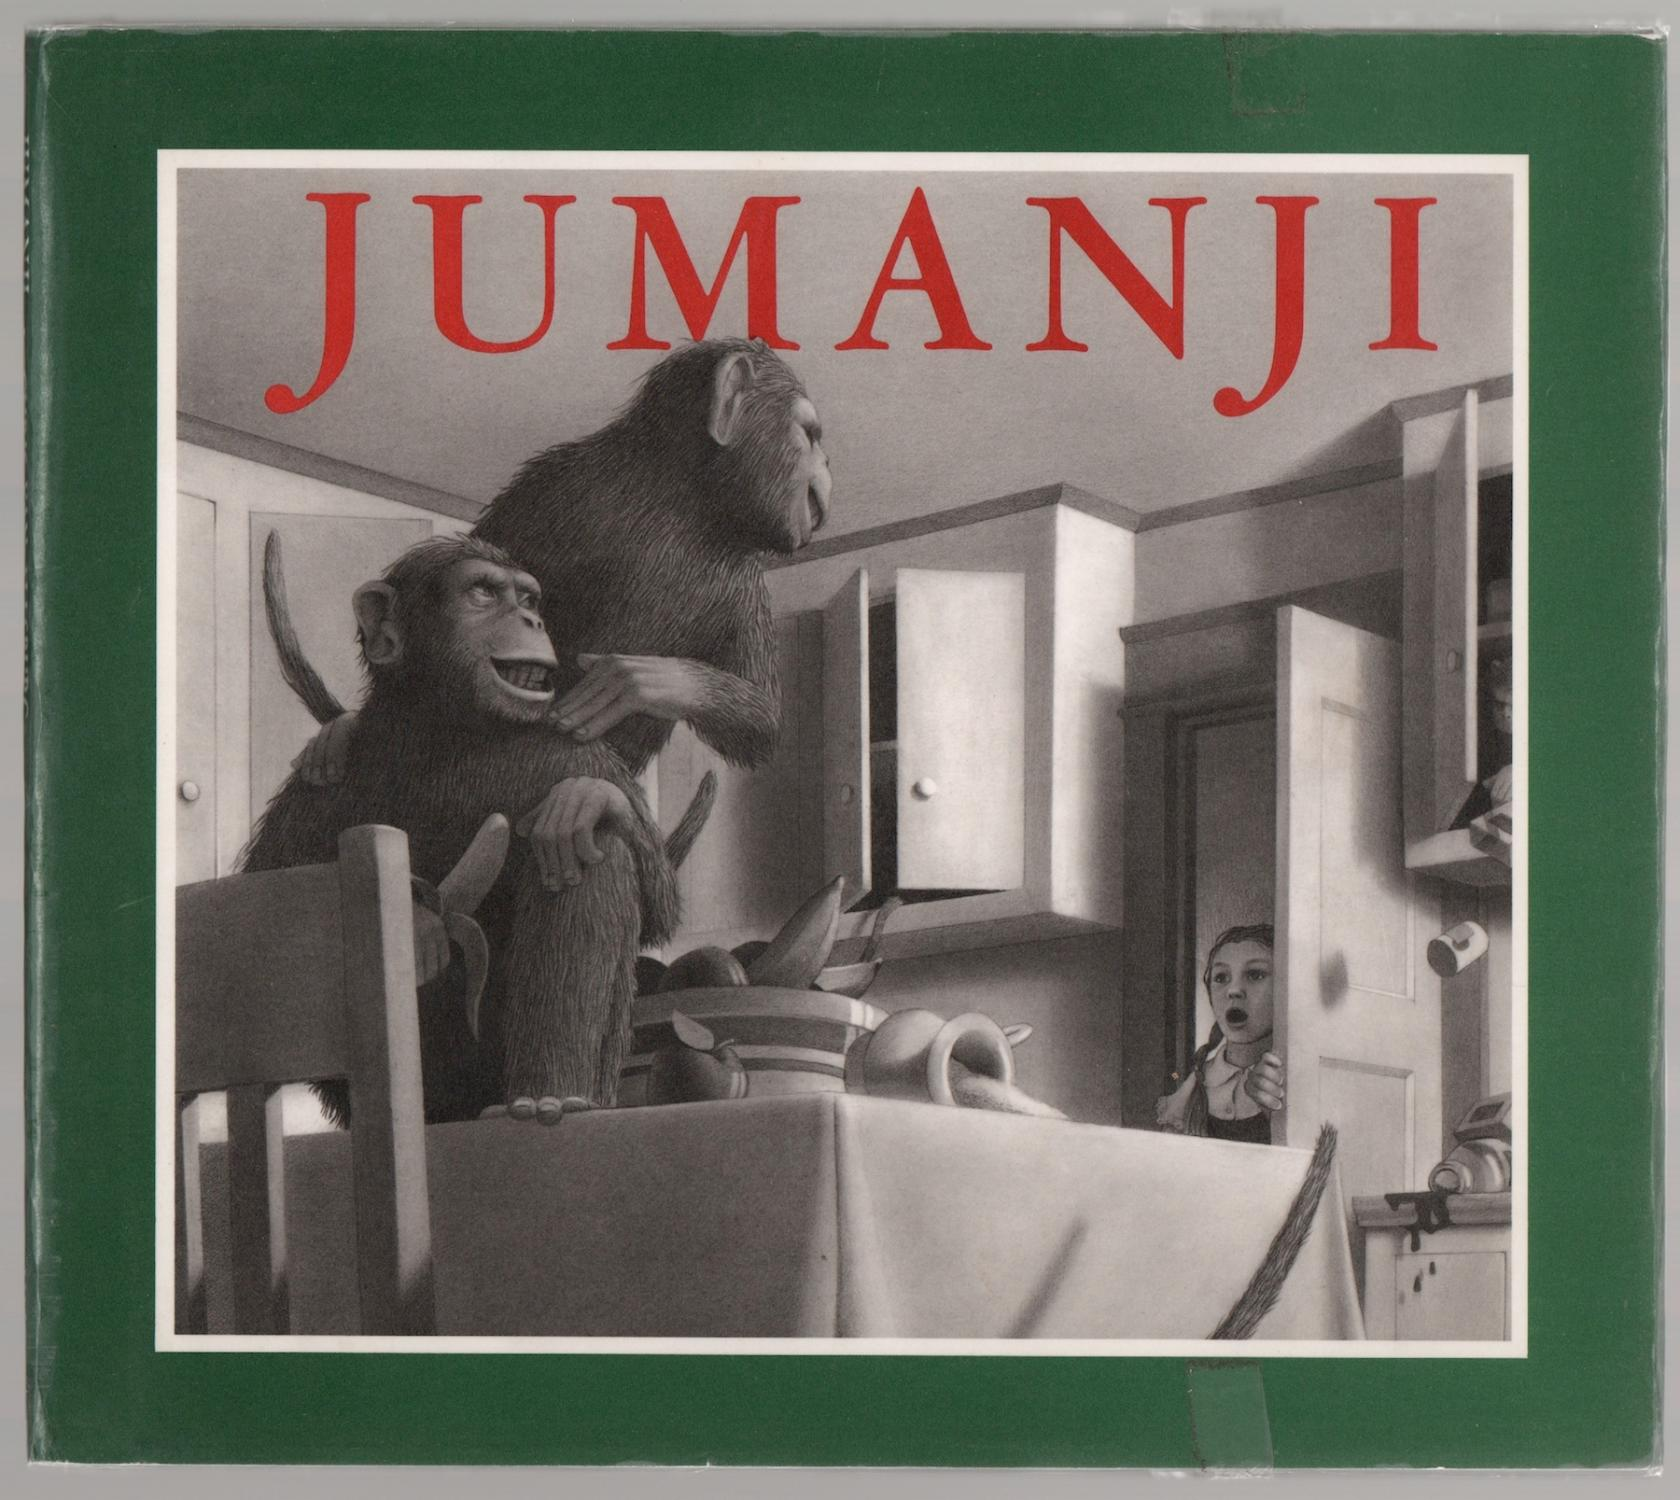 cover of Jumanji by Chris Van Allsburg